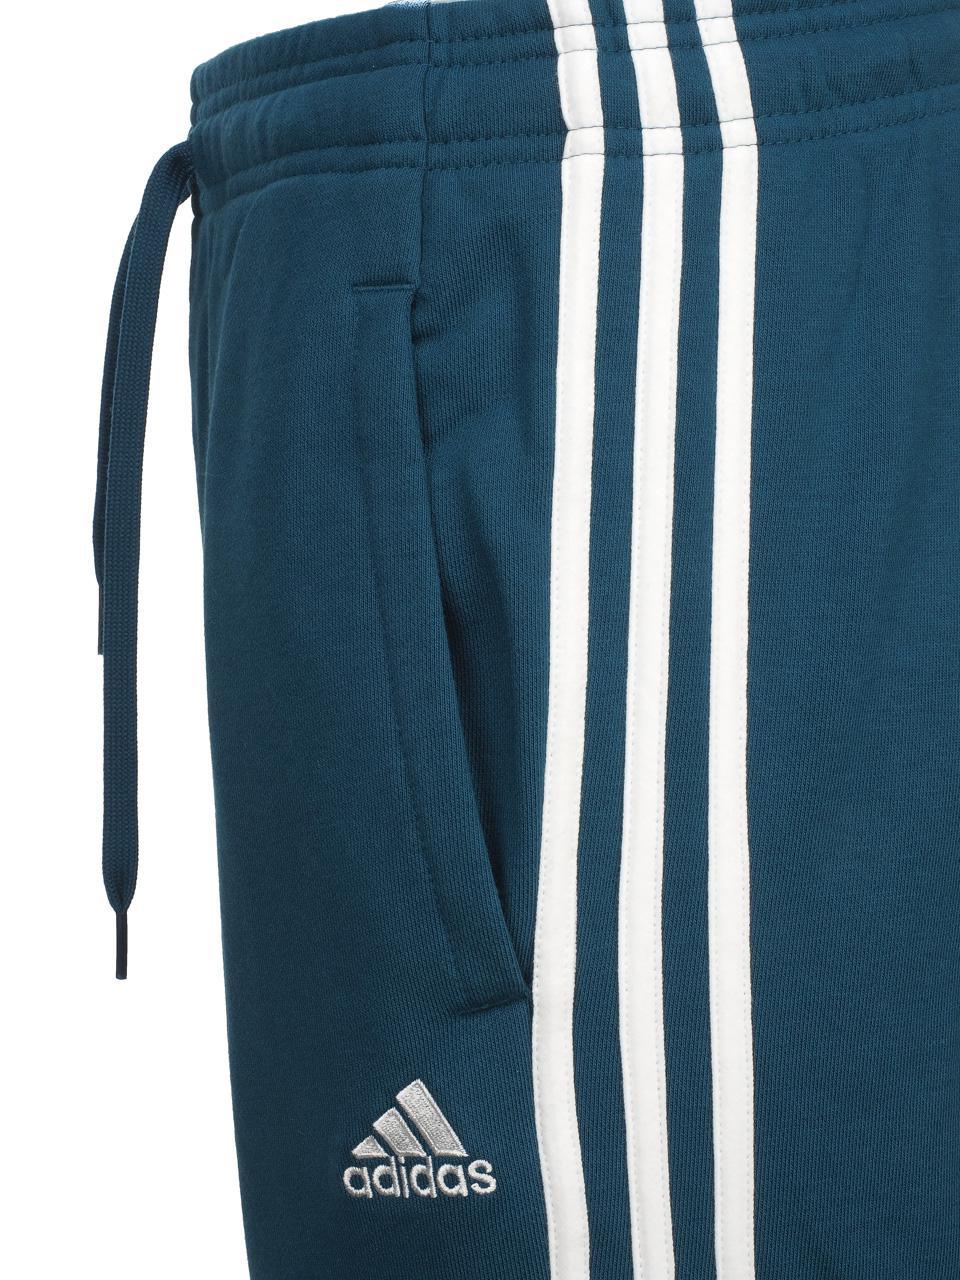 Pantalon-joueur-Adidas-Real-pant-17-18-madrid-Bleu-74776-Neuf